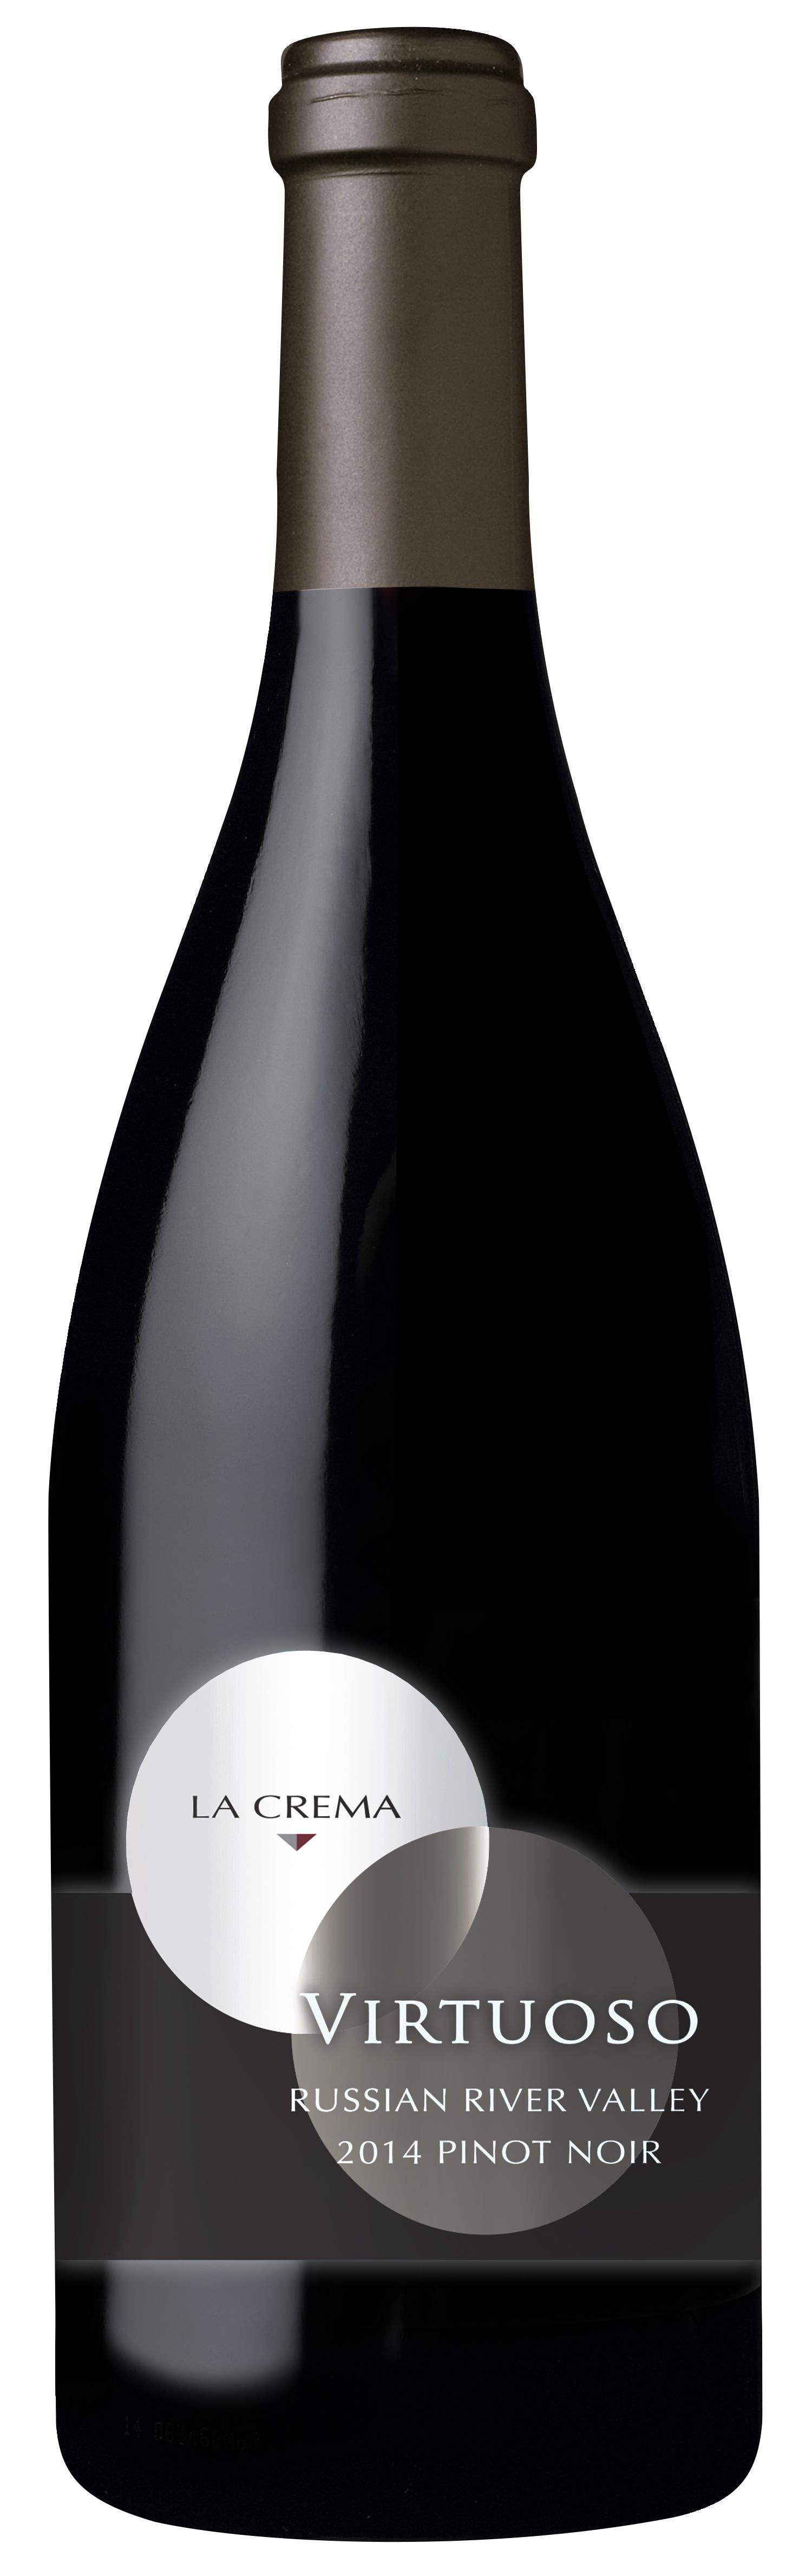 2014 La Crema Virtuoso Pinot Noir Russian River Valley